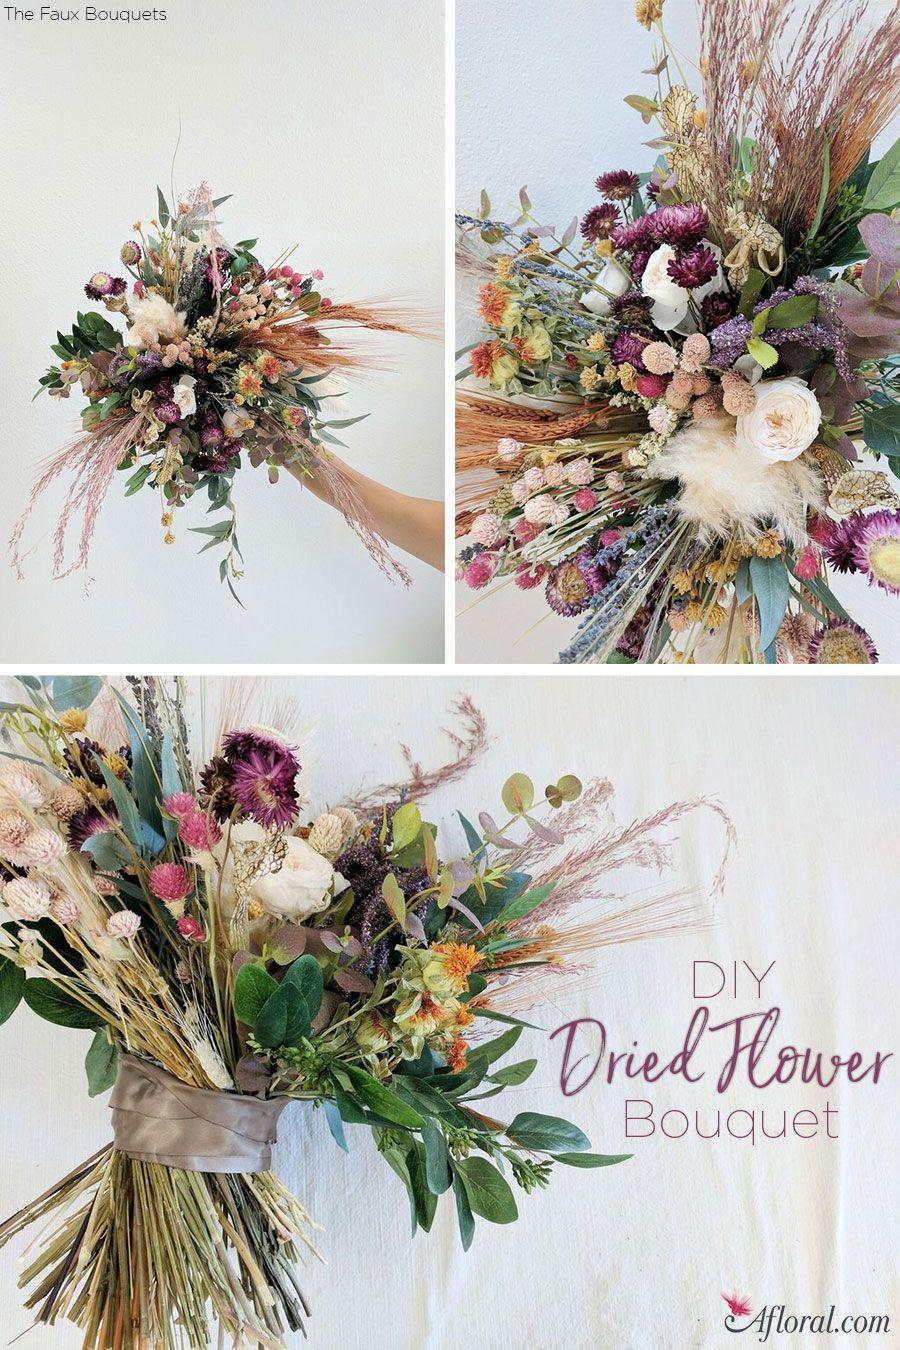 Dried Flower Bouquet | Flower bouquets, Flower and Wedding planning ...